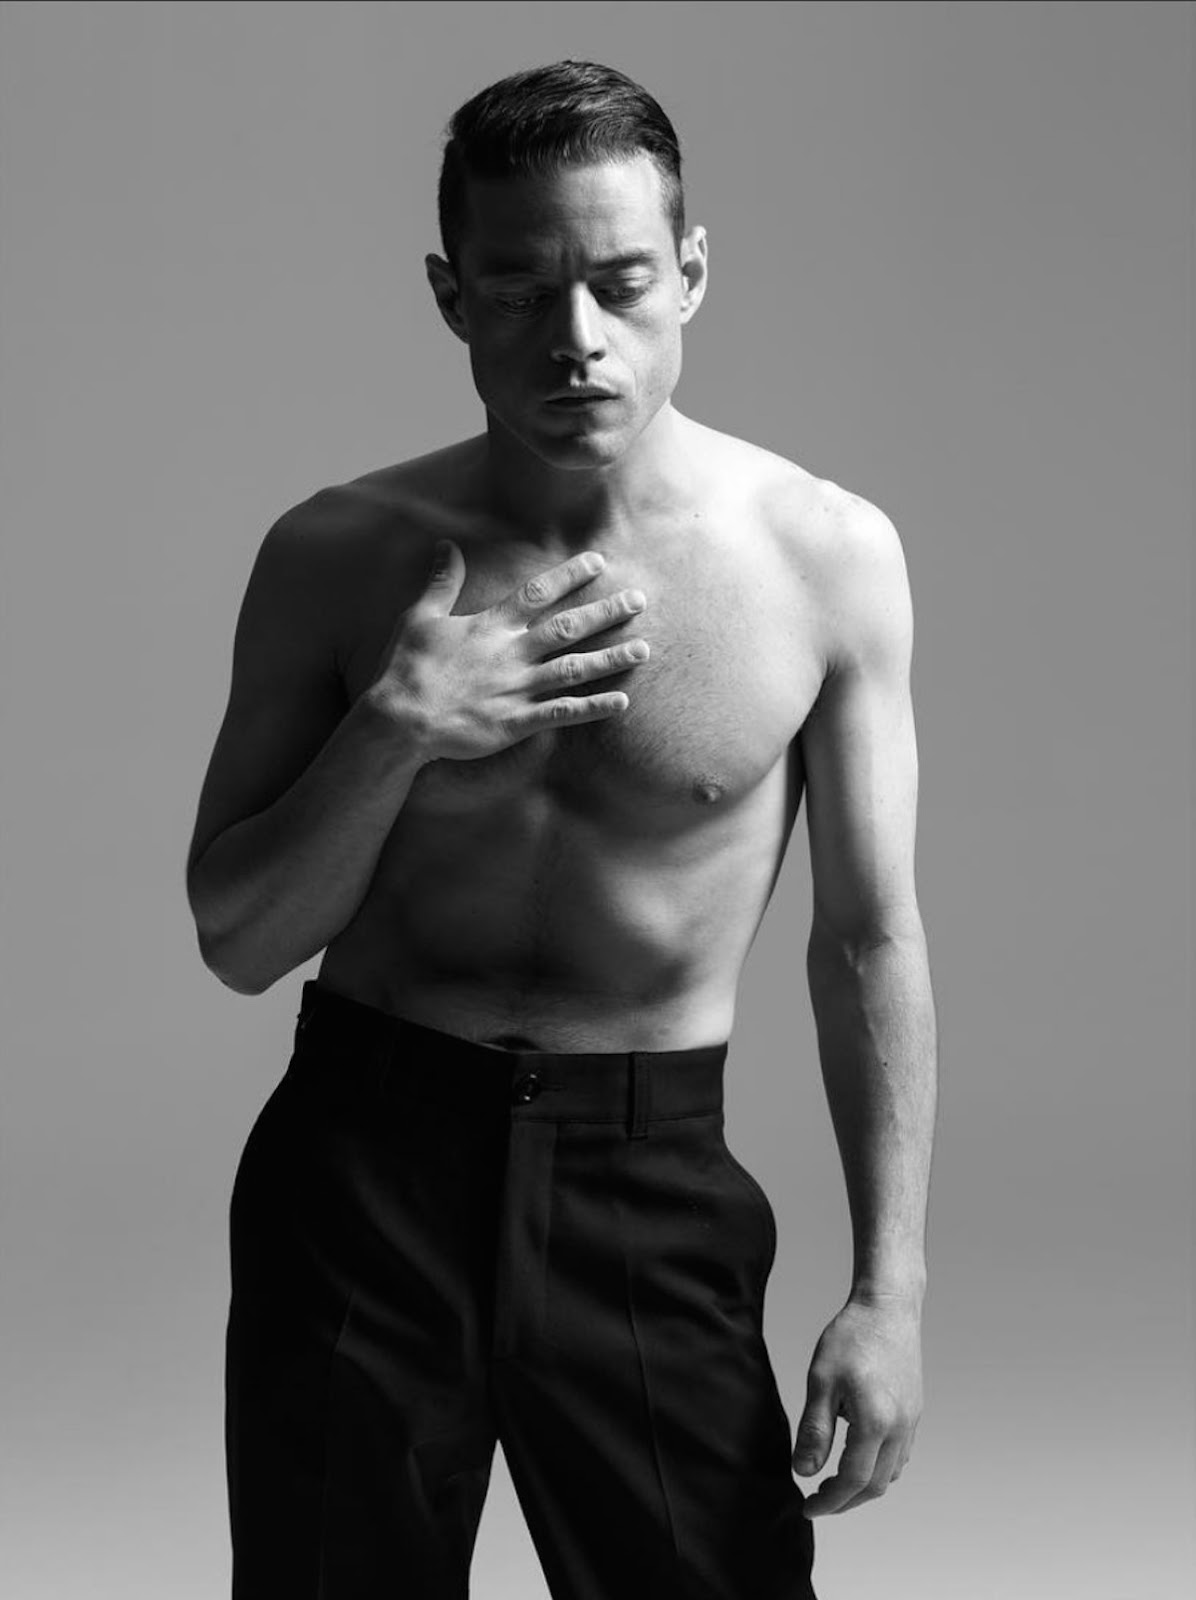 my new plaid pants: Rami Malek One Time